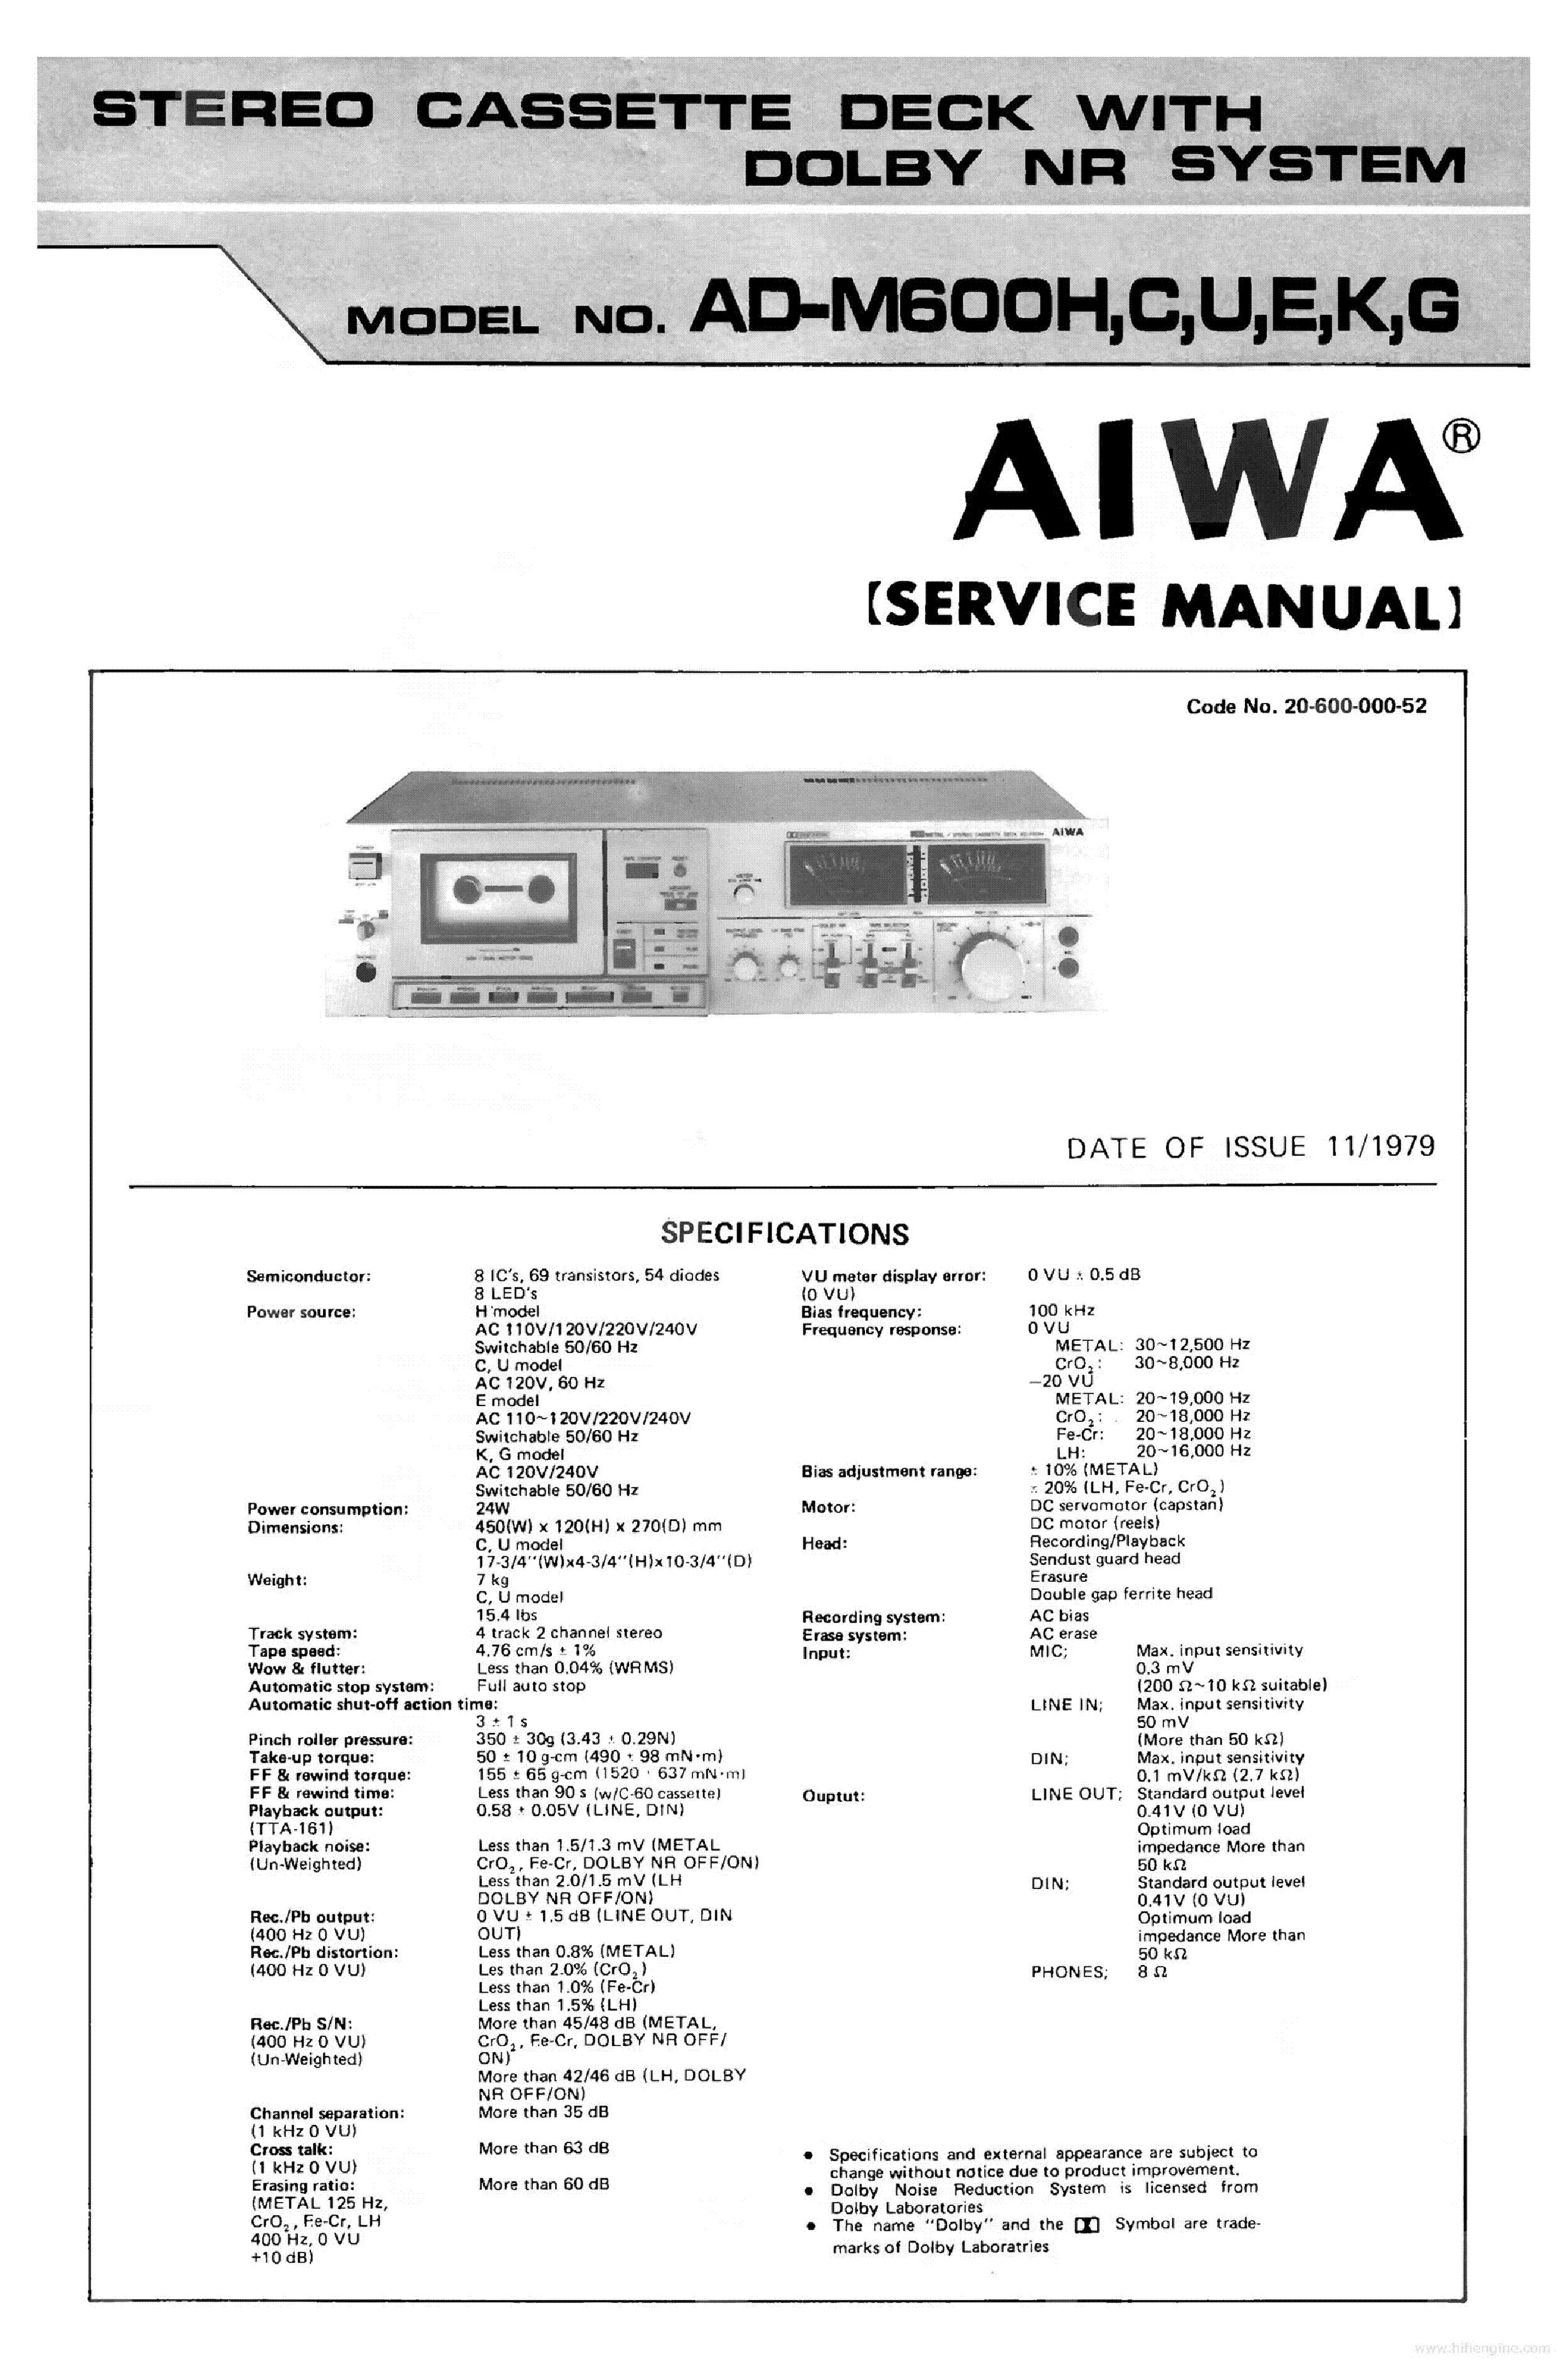 Aiwa MM-EX300 Drivers for Windows XP